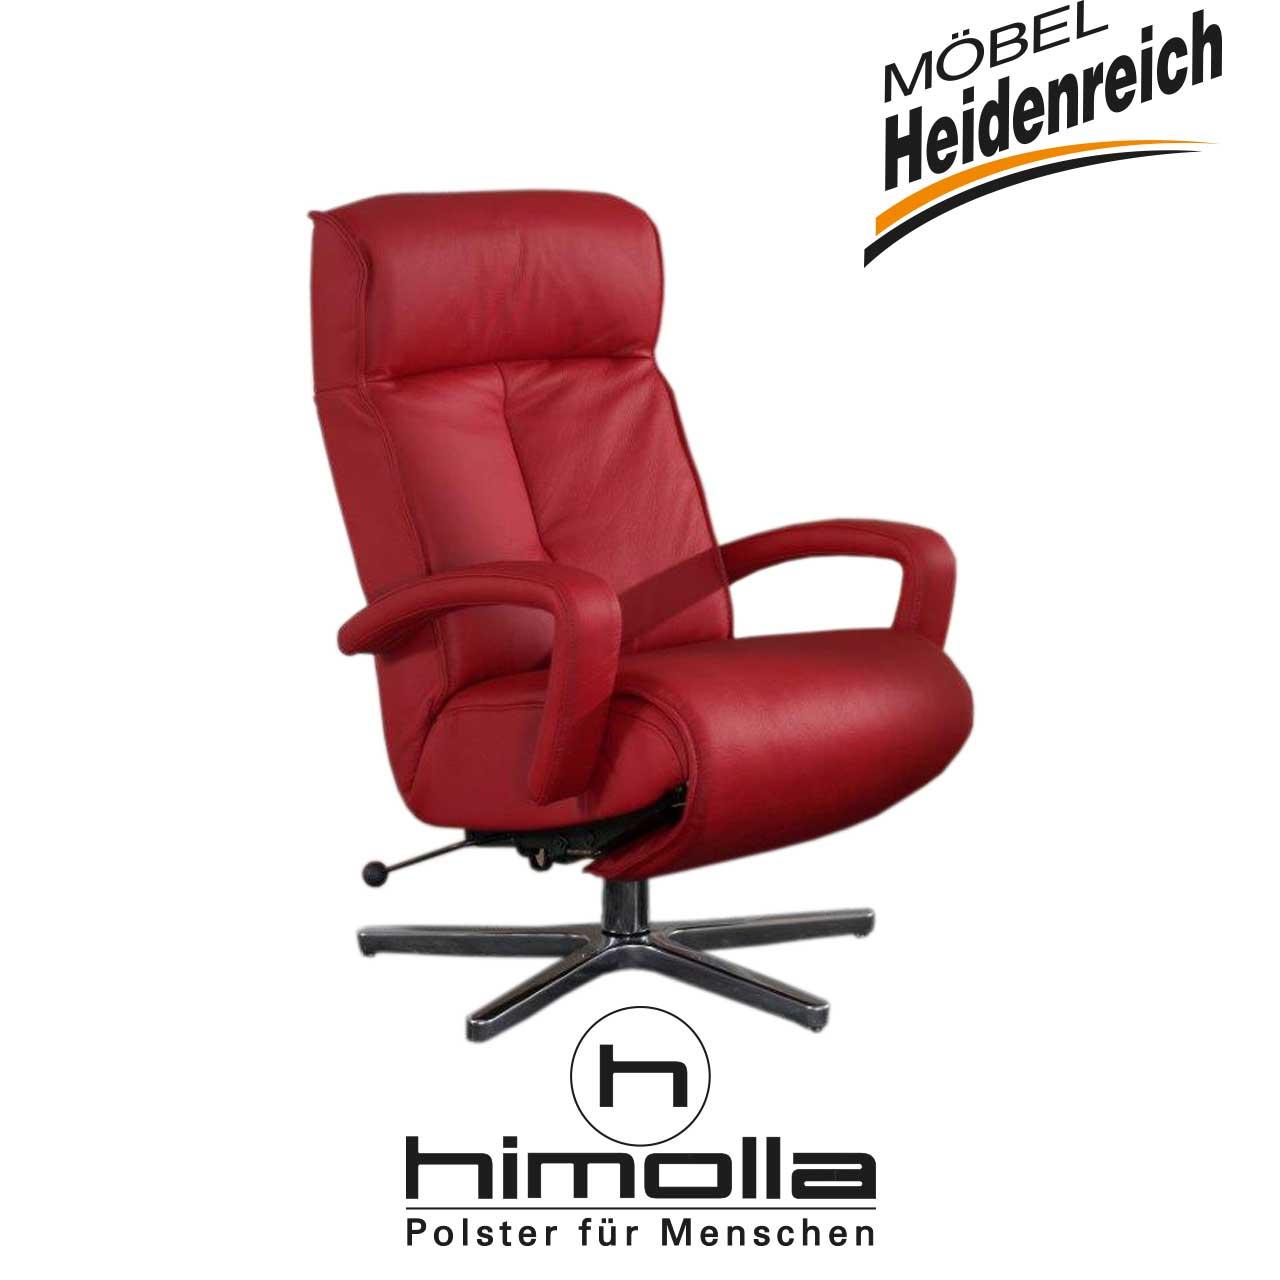 Himolla Cosyform 7045 Möbel Heidenreich